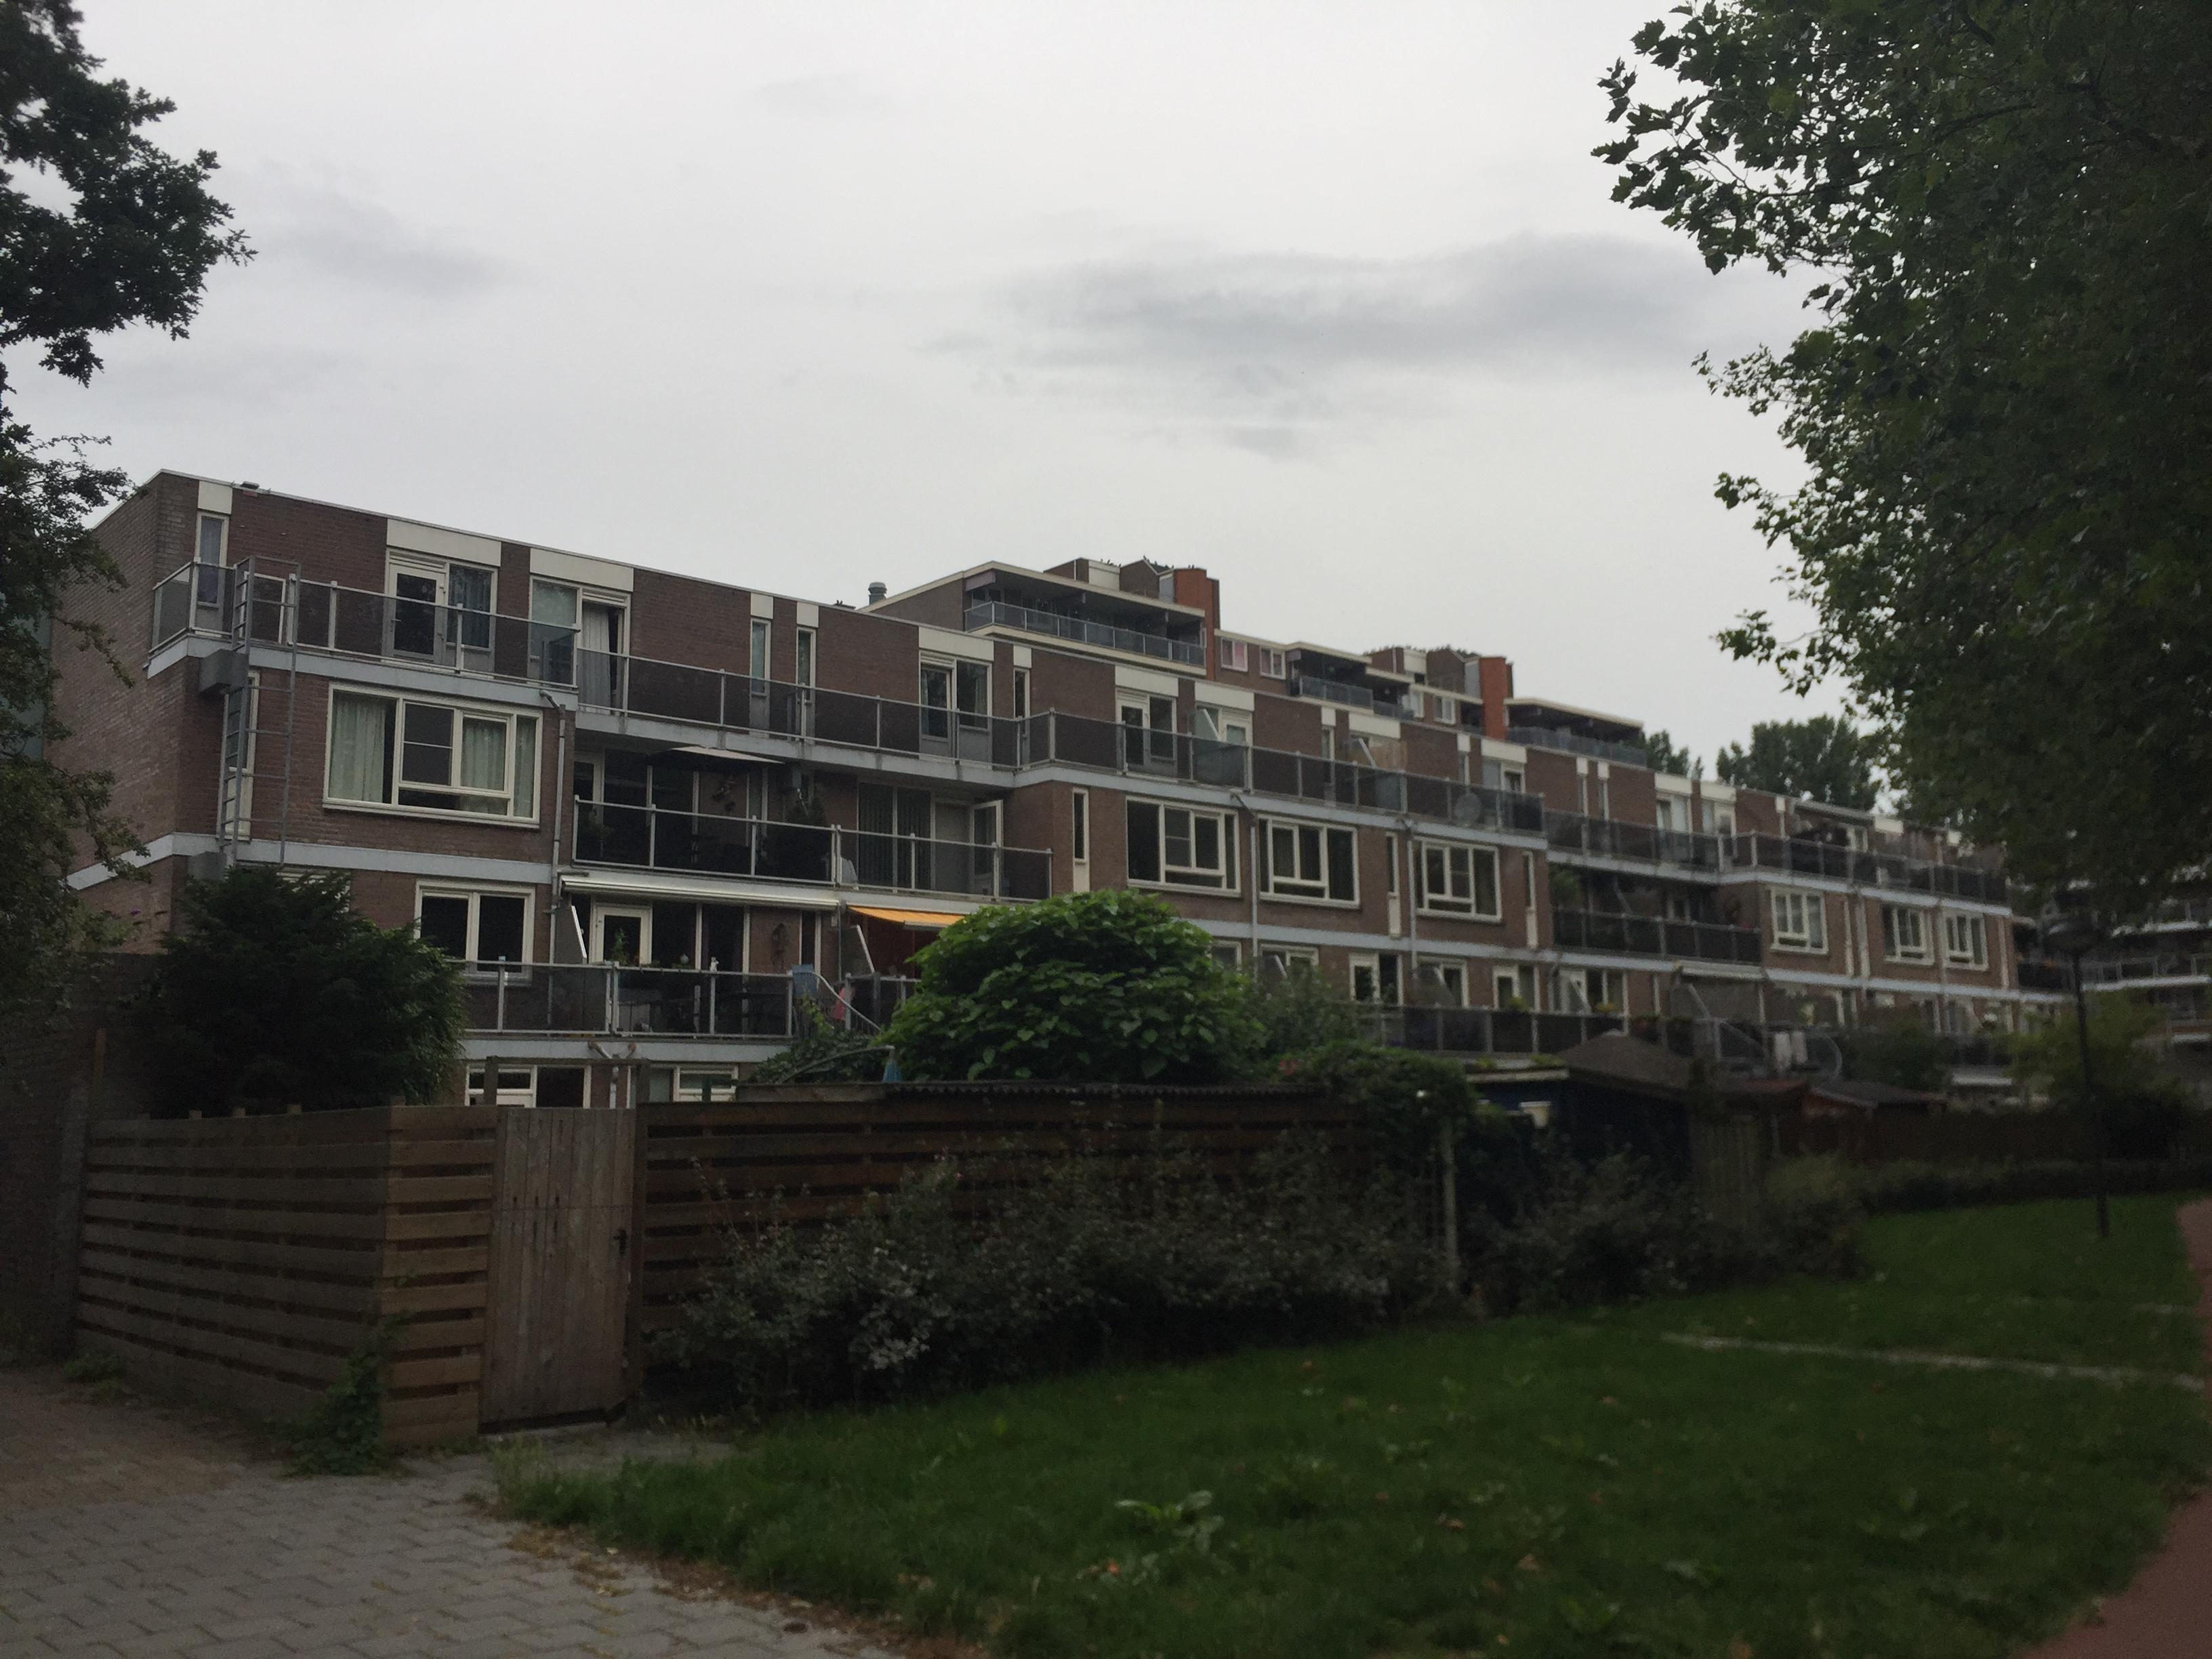 SkymarkVvE-VvE Prattenburg Haarlem